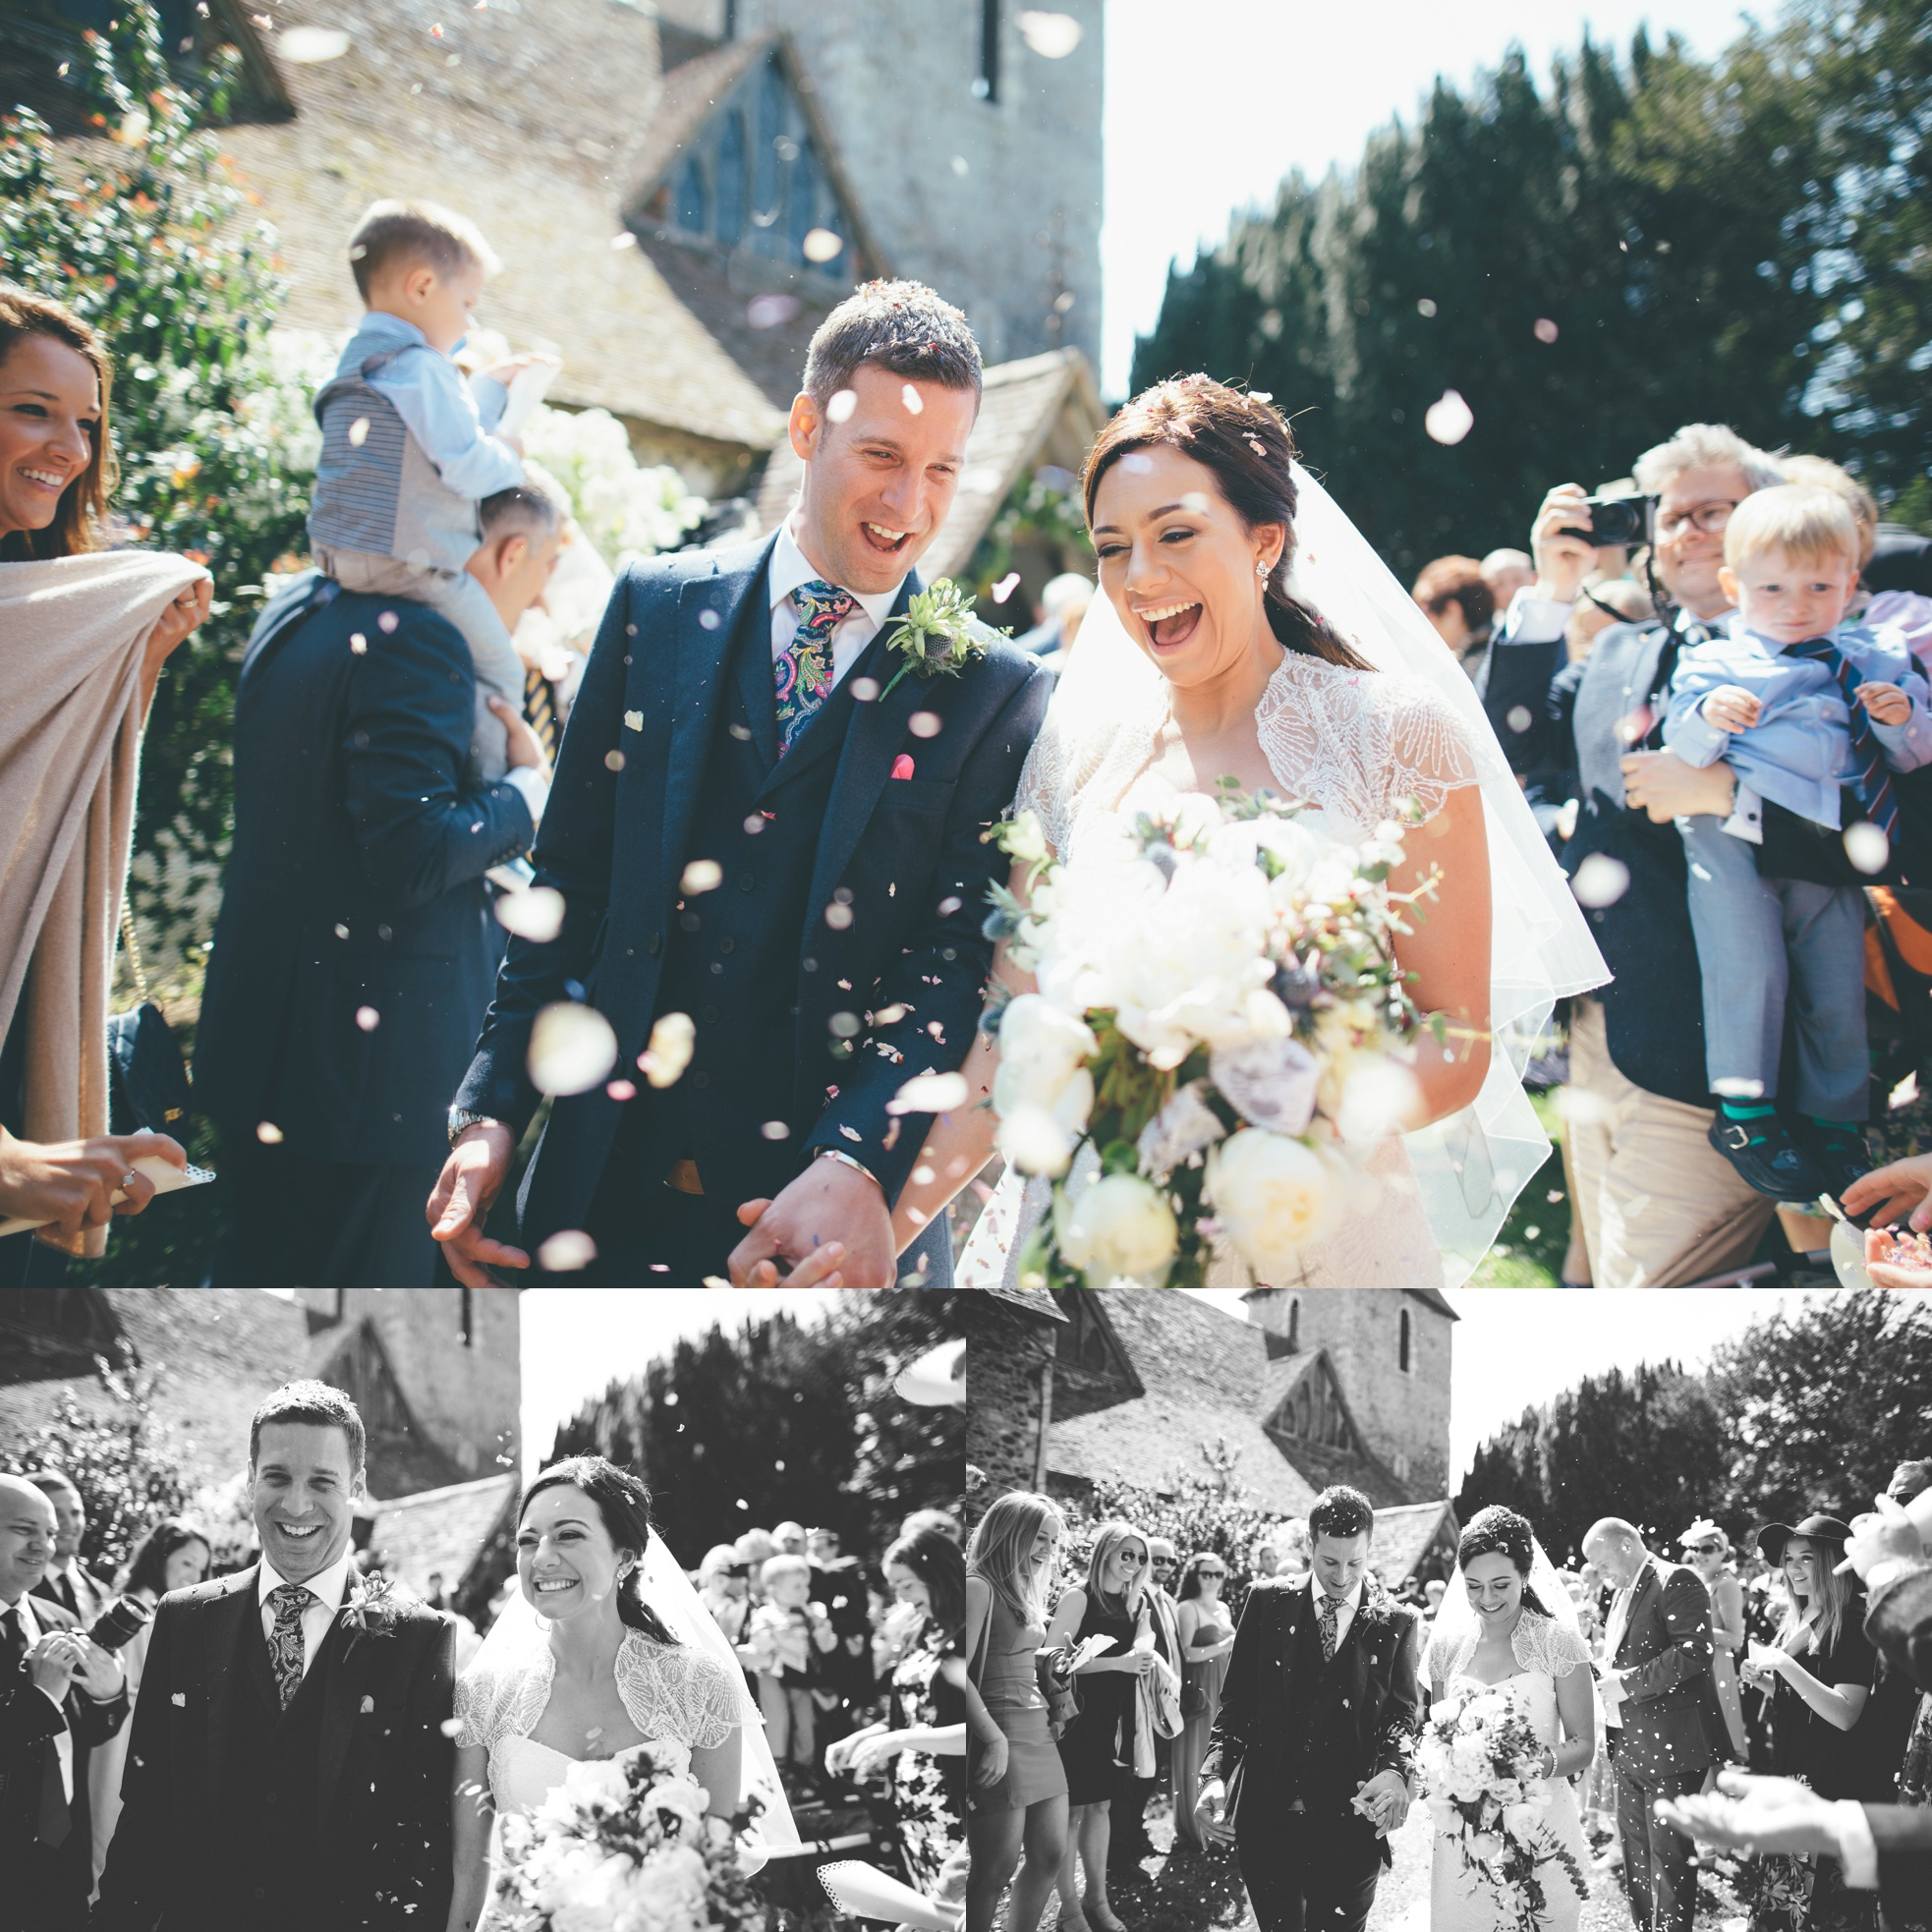 ClaireKieranwedding_PrestonCourtCanterbury_0017.jpg